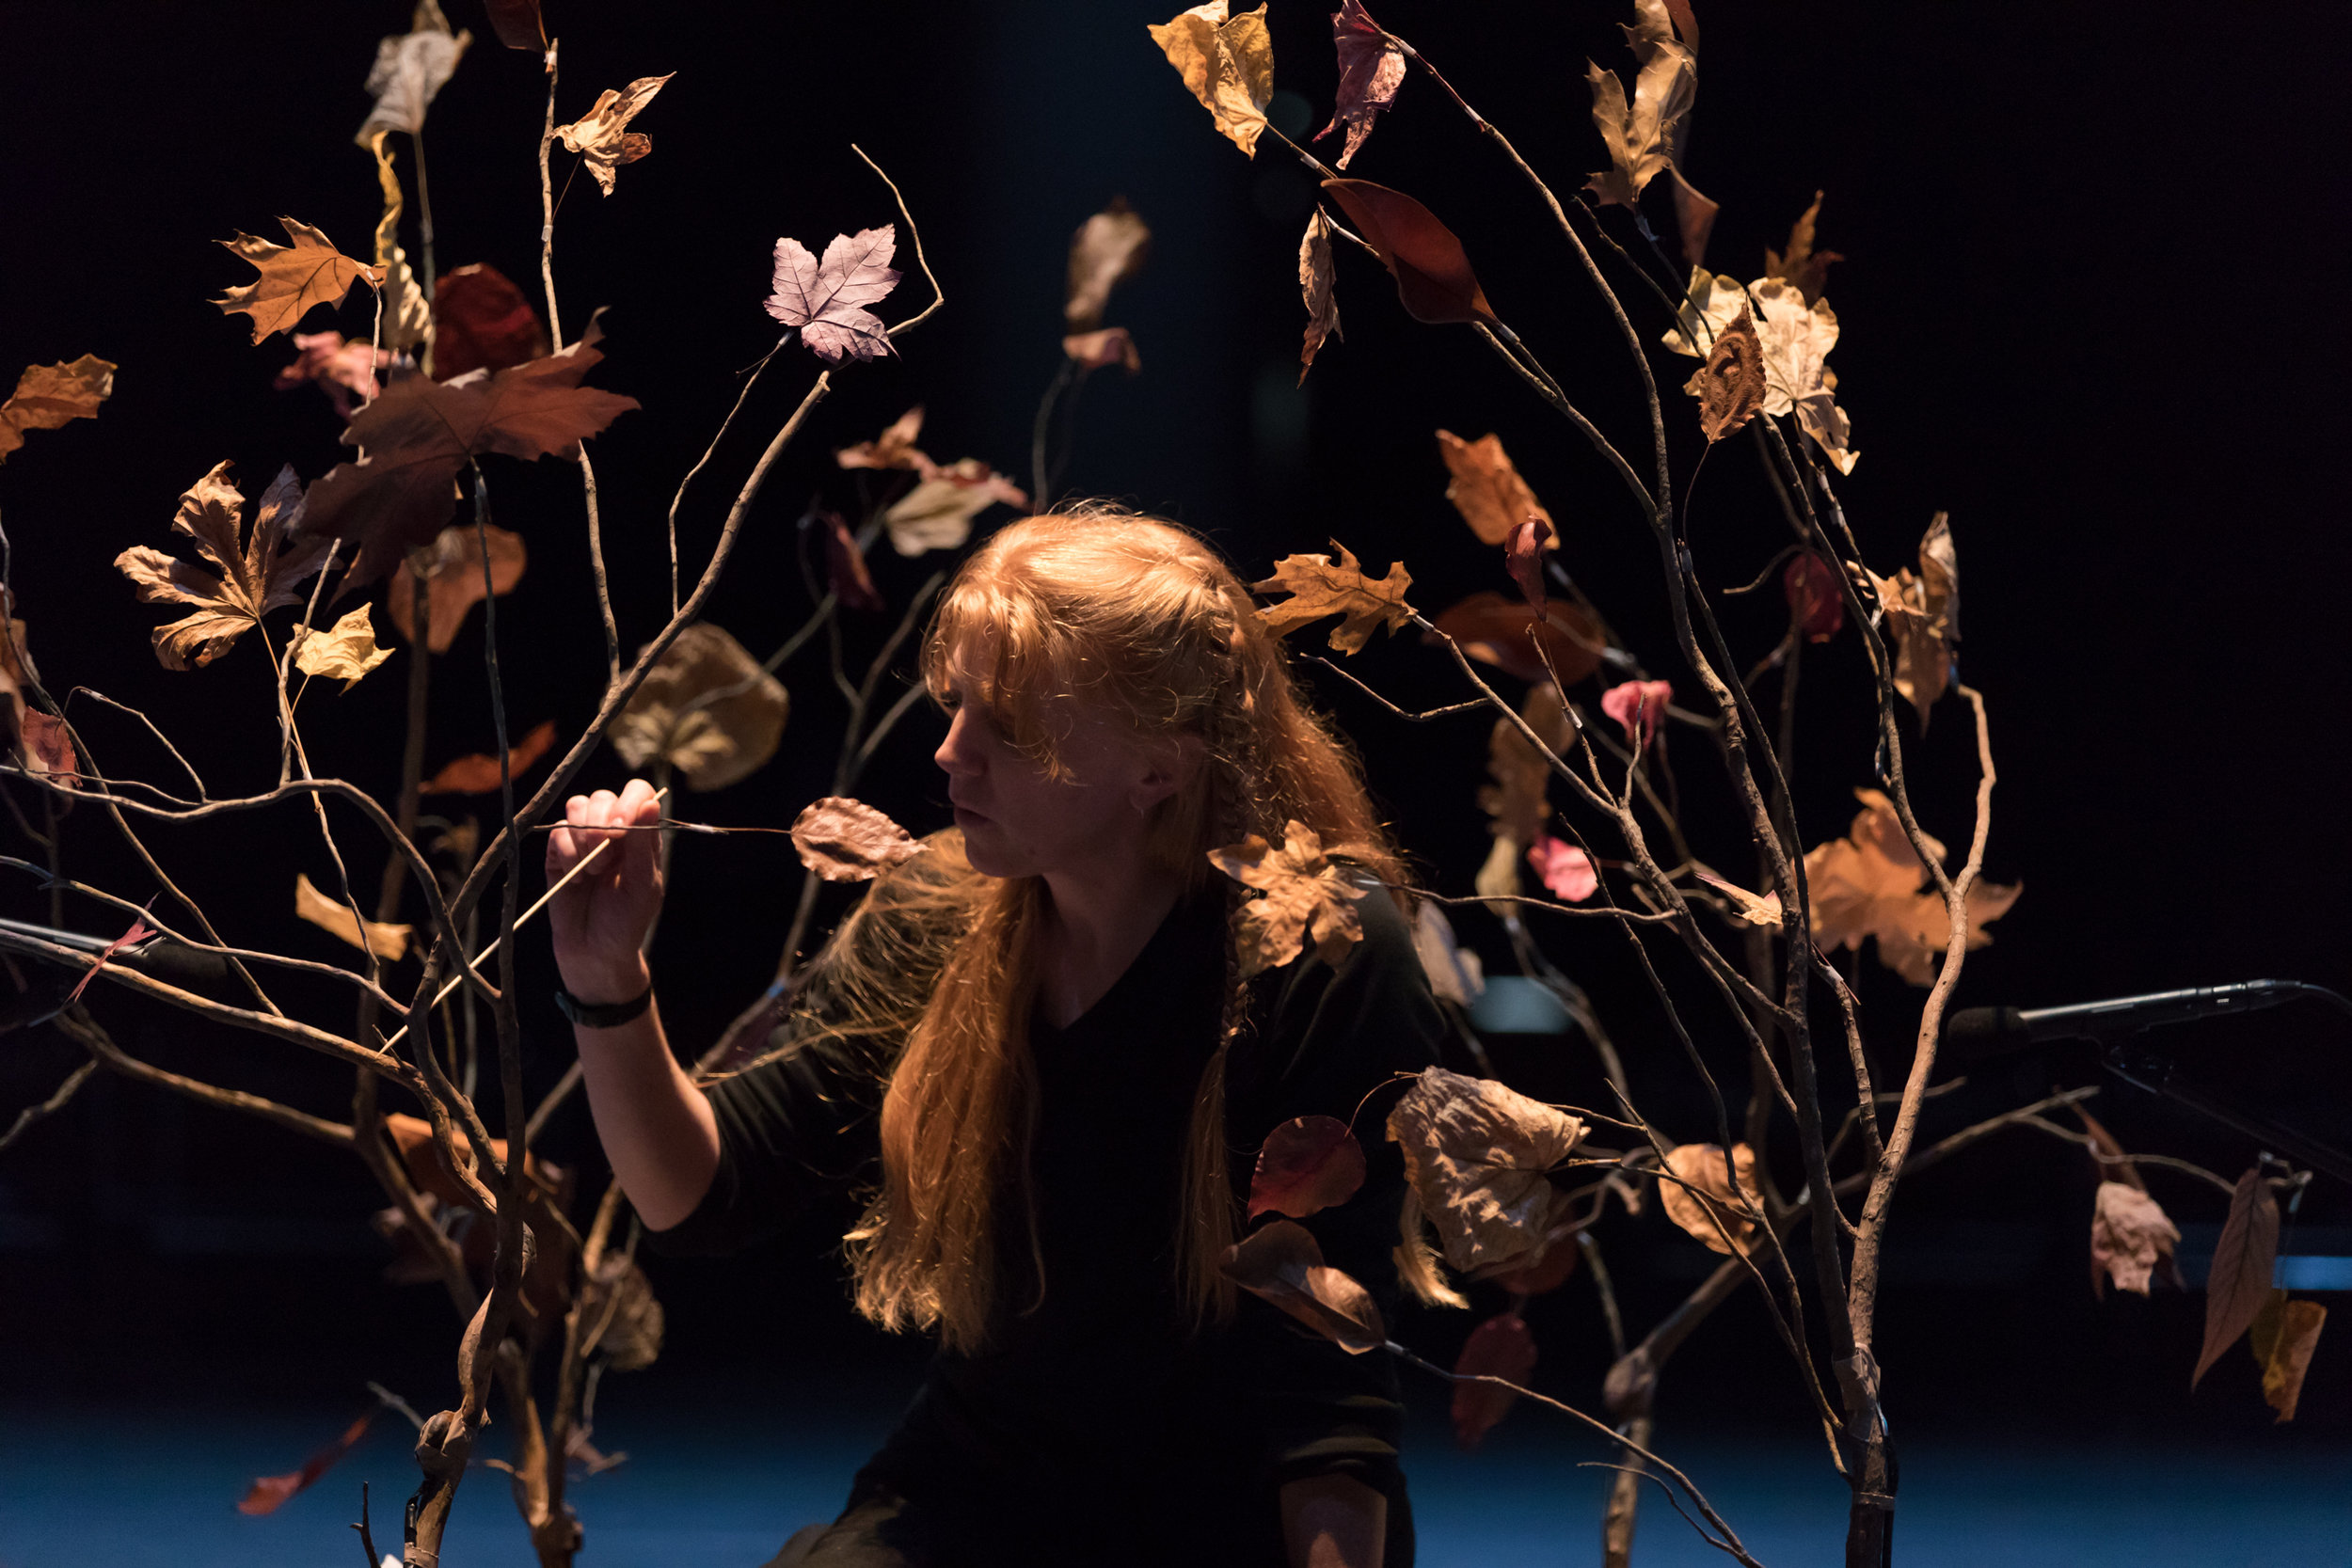 Cheryl Leonard performing  Asterisms  at Yerba Buena Center for the Arts. Photo by Margo Moritz.